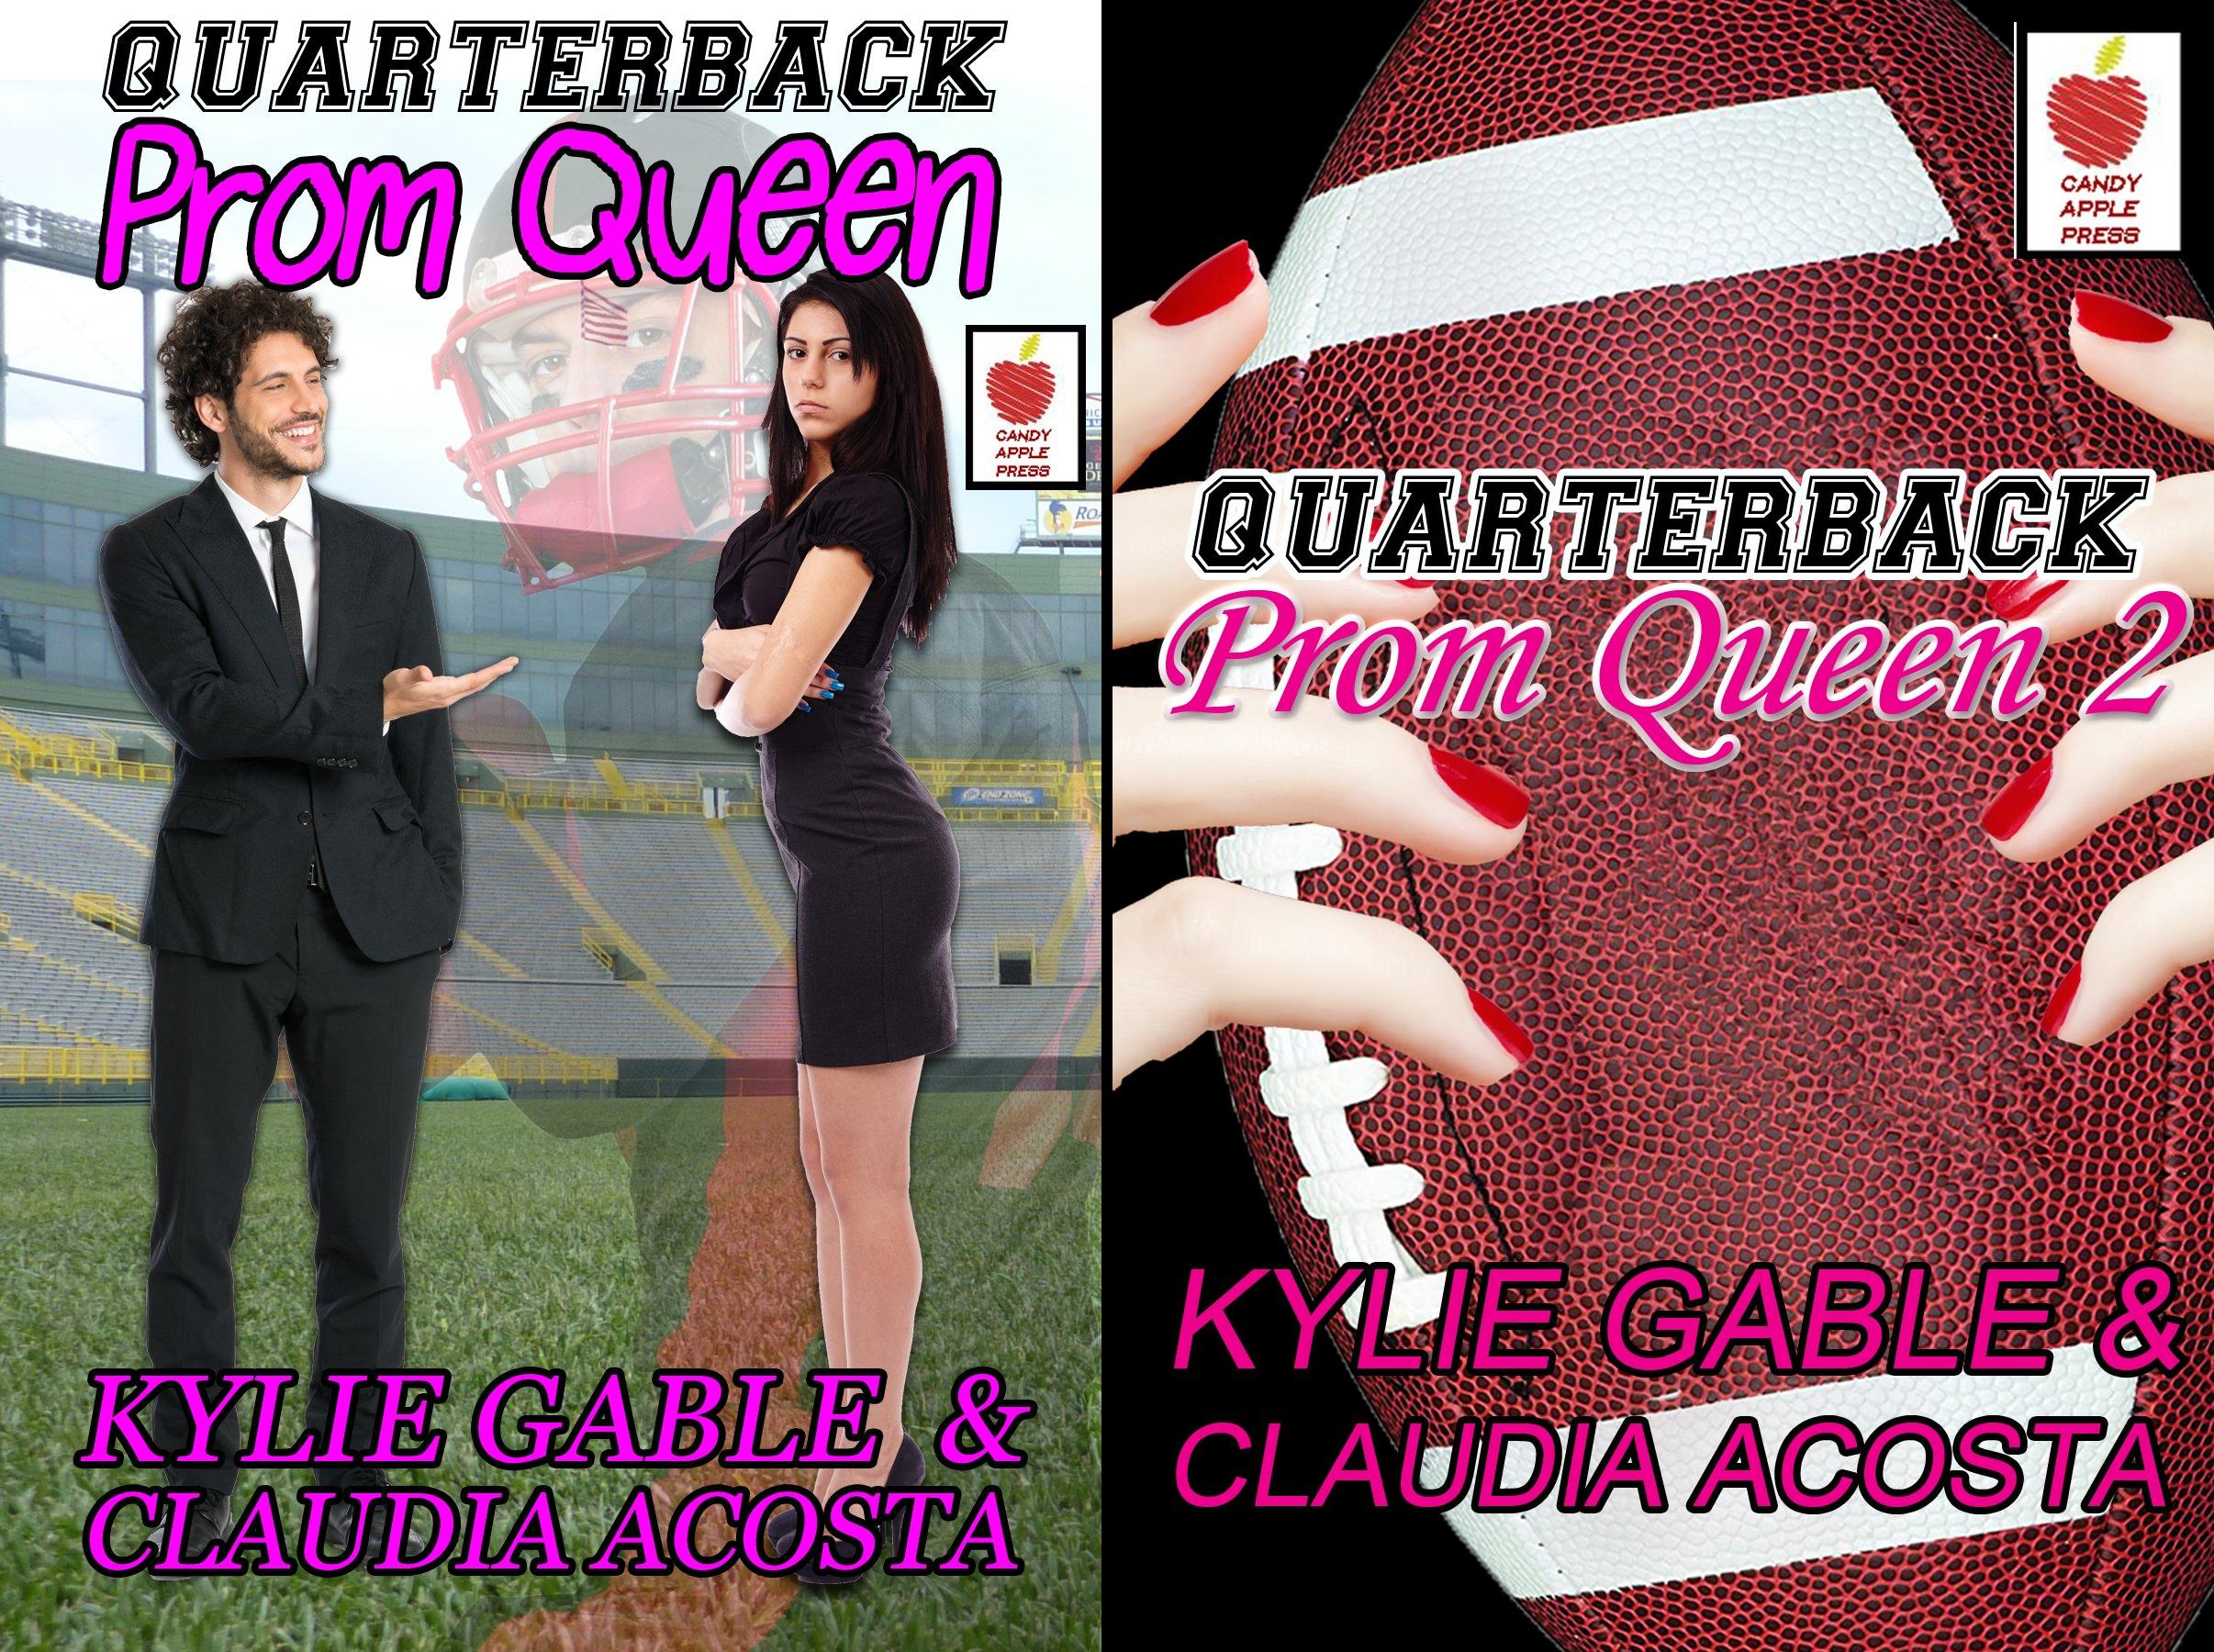 Quarterback Prom Queen (2 Book Series)